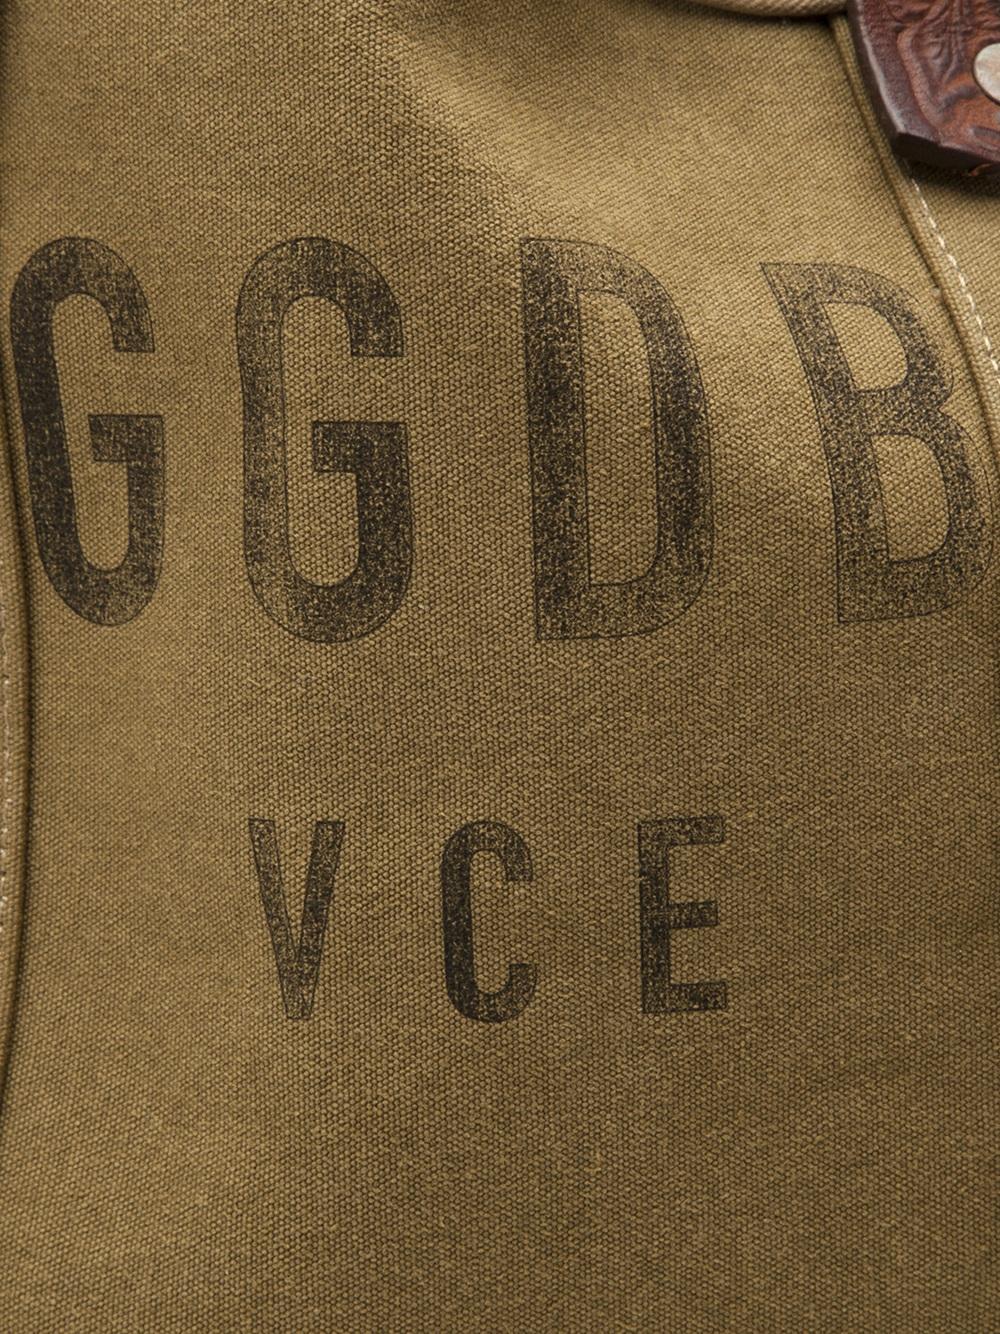 Golden Goose Deluxe Brand Canvas Tote in Green (Brown)